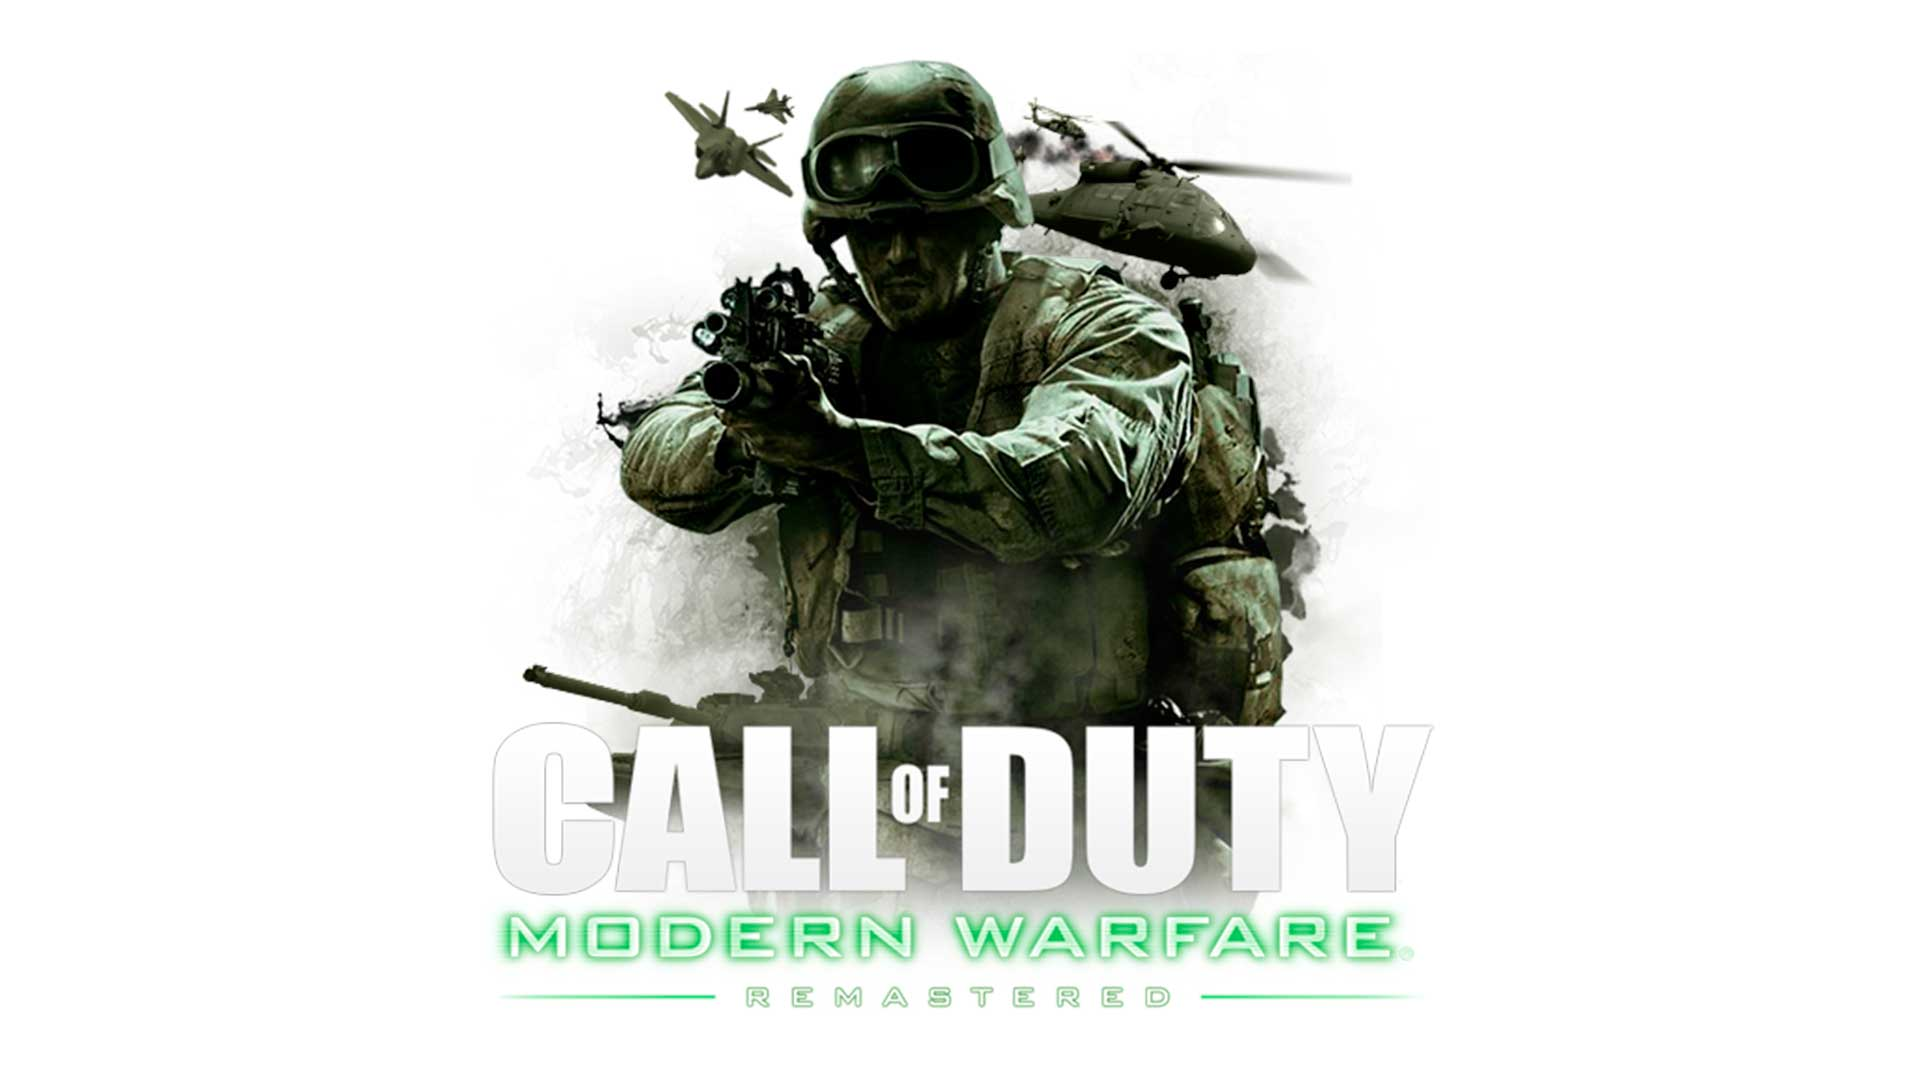 comprar Modern Warfare Remastered